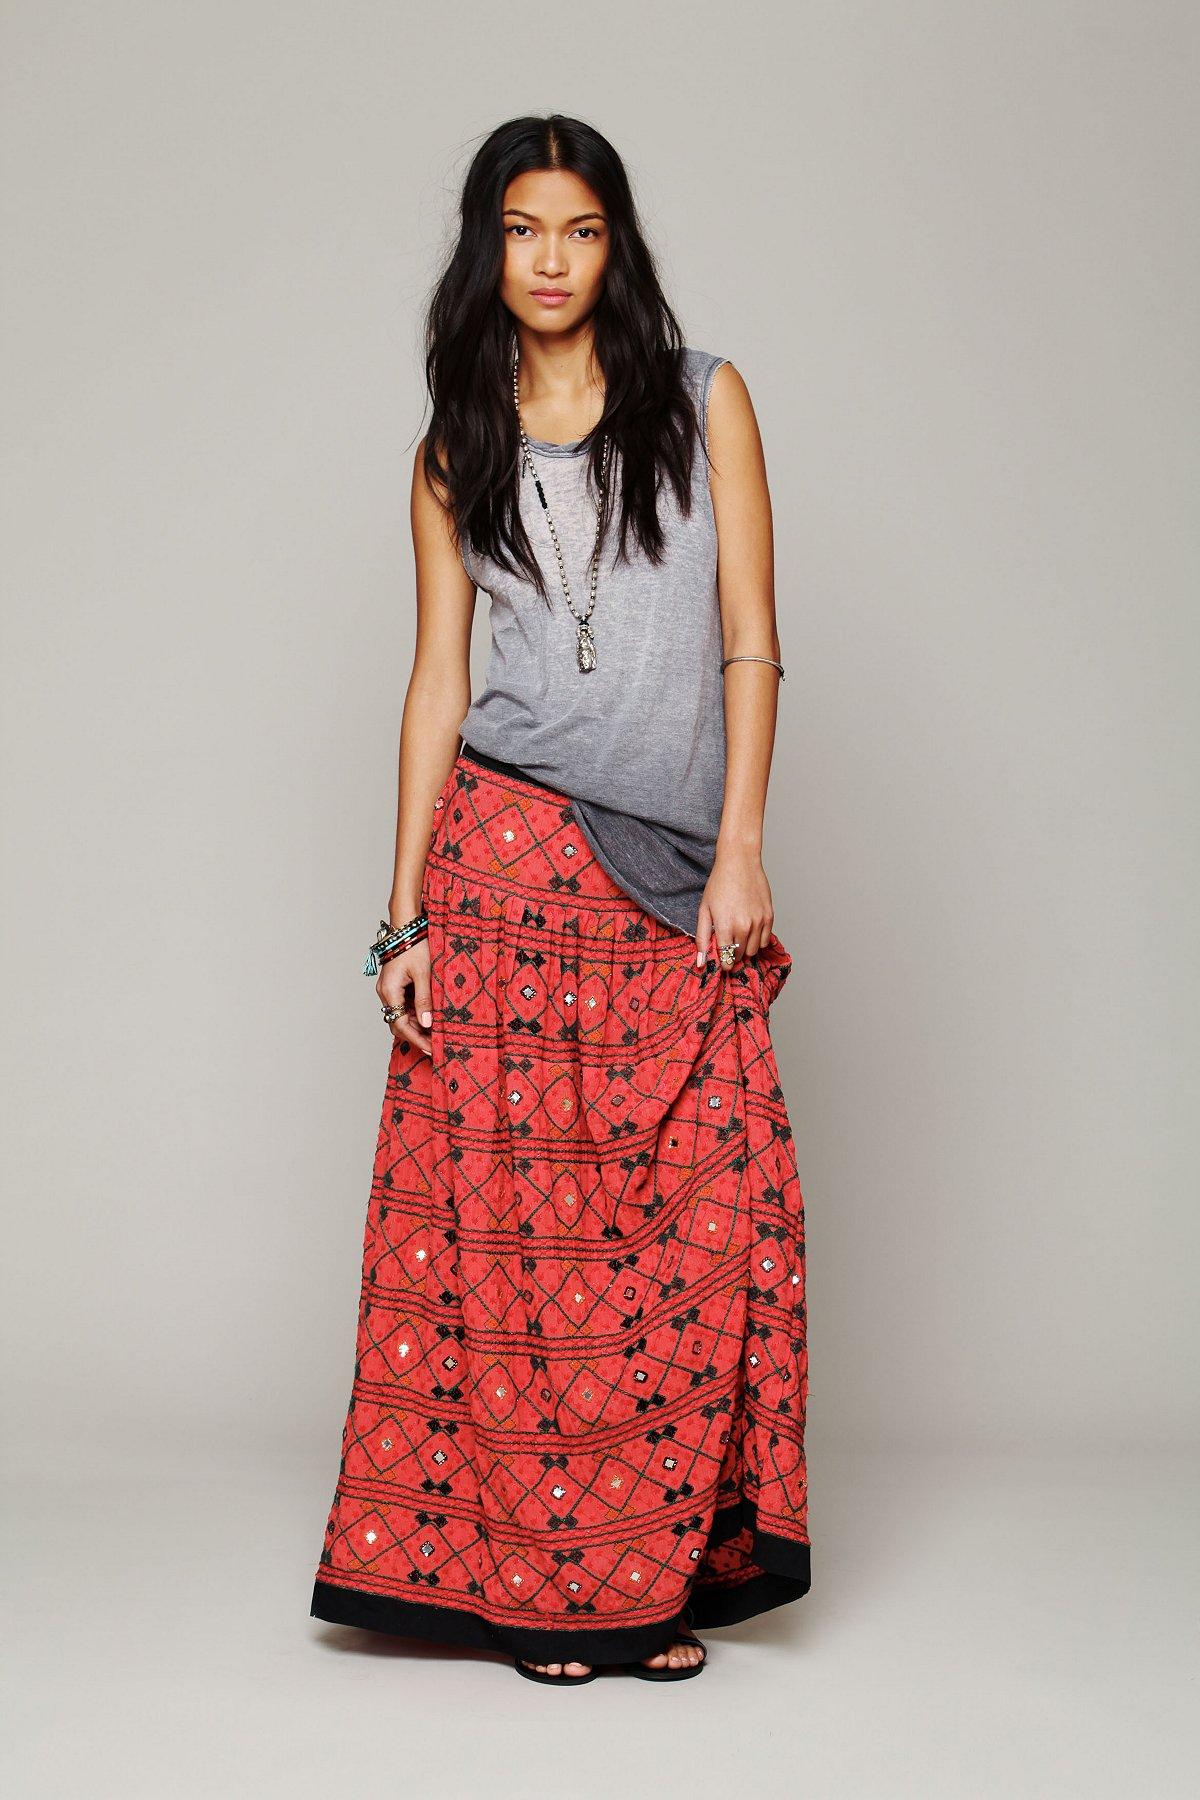 Delhi Dreams Skirt